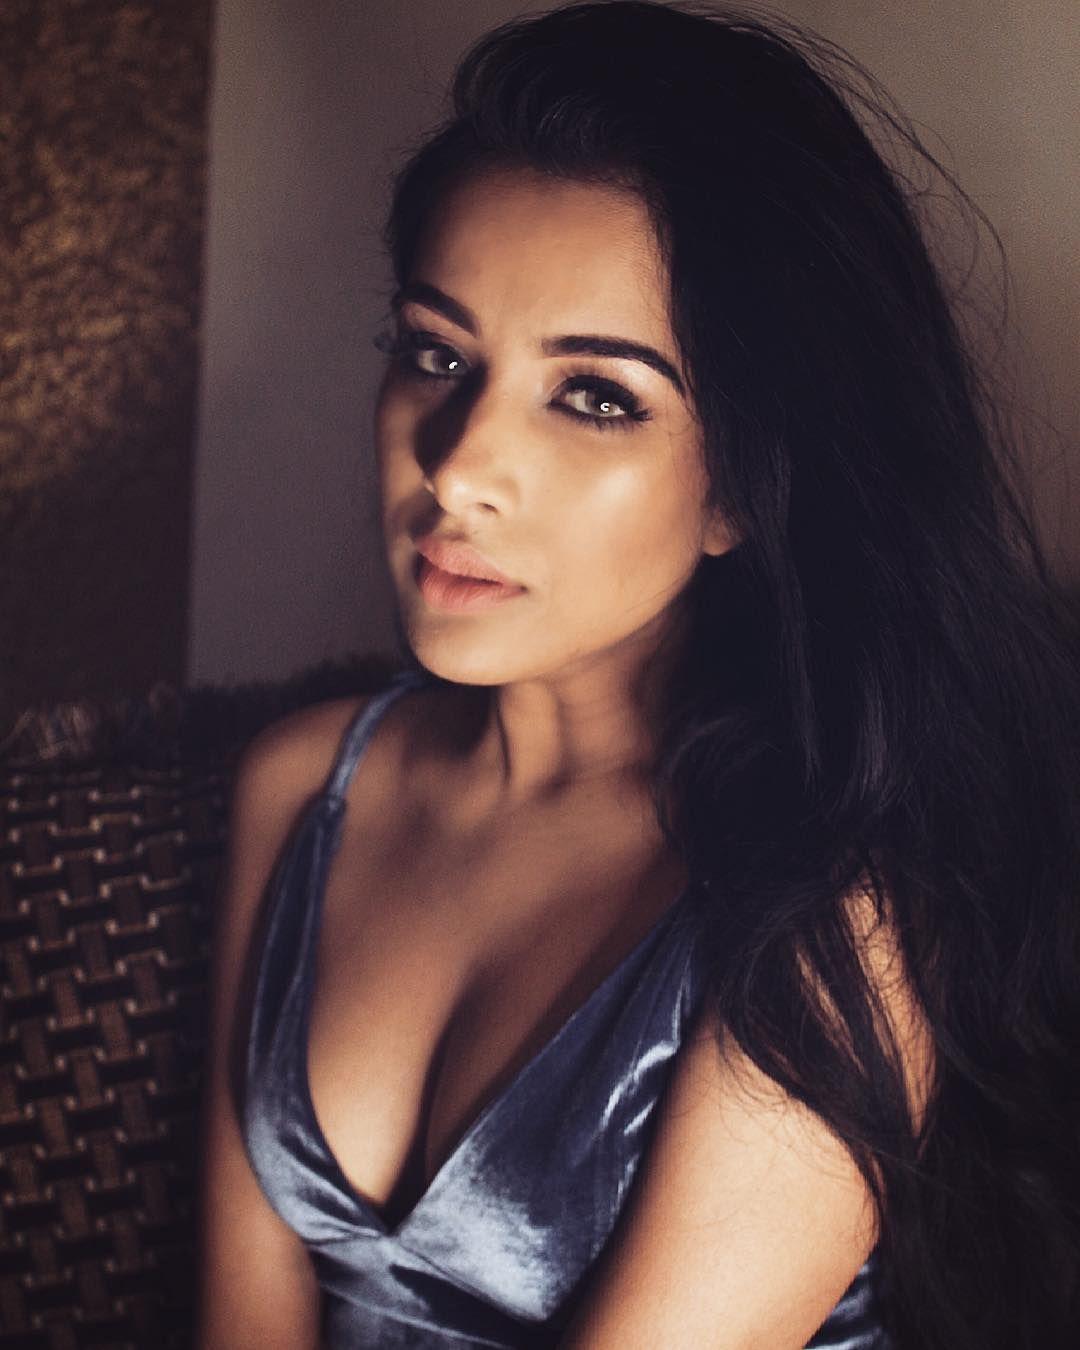 621K Likes, 480 Comments - Sara Gurpal Saragurpals On -9638